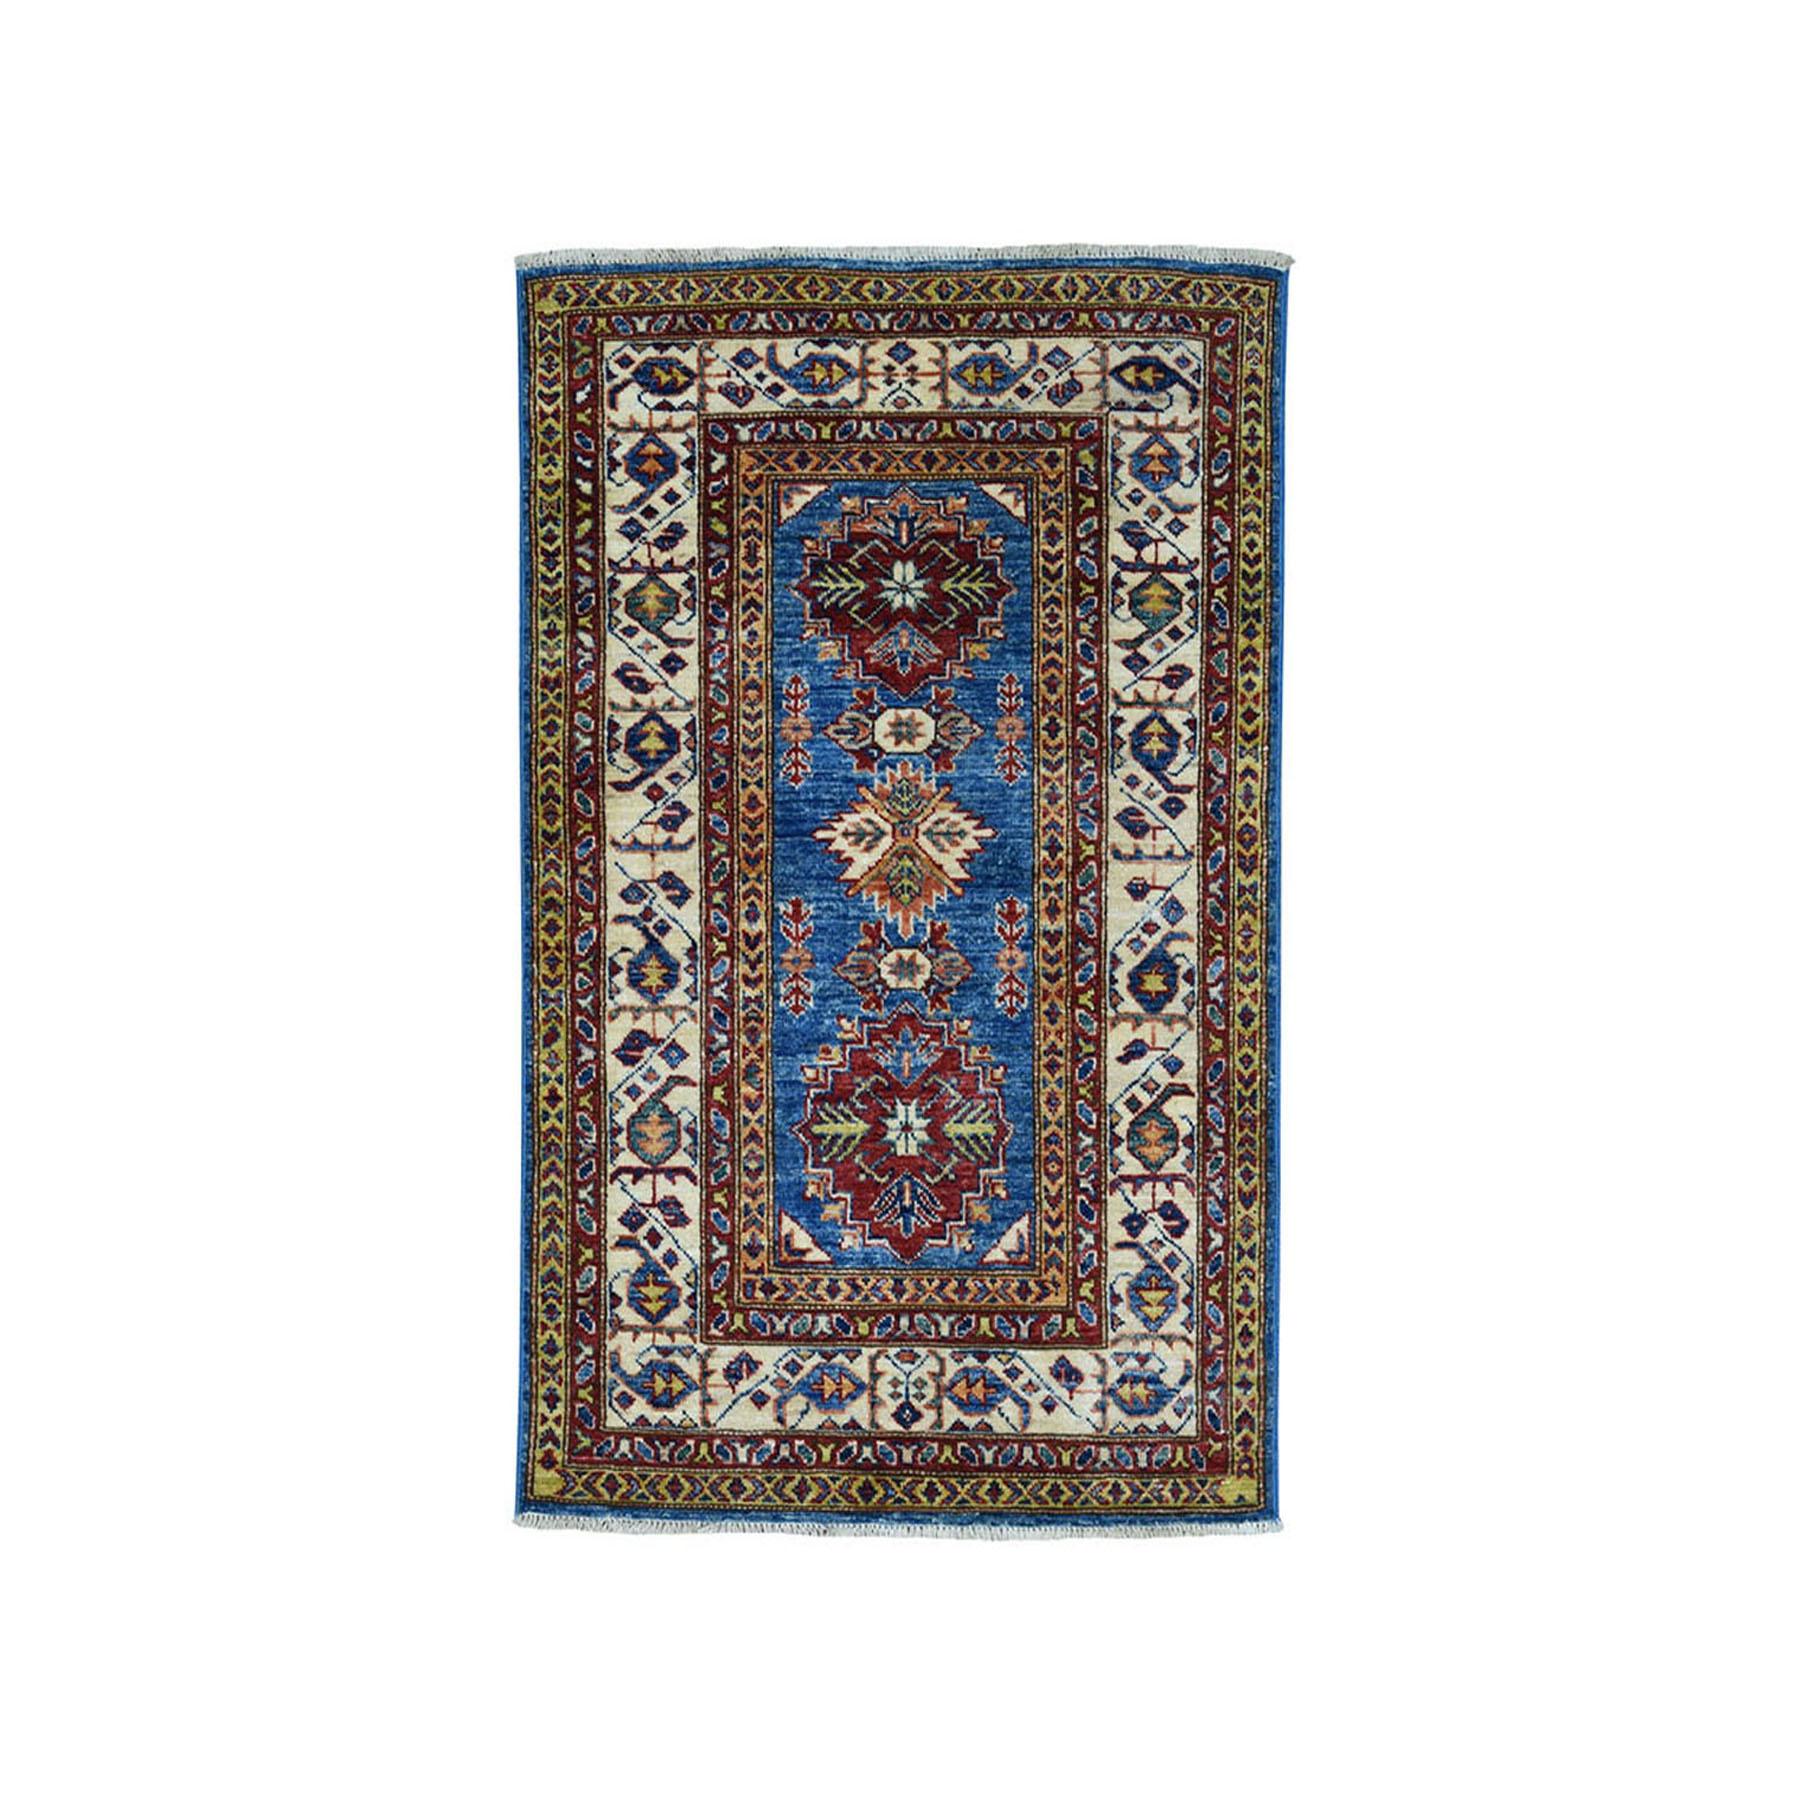 "2'9""X4'2"" Blue Super Kazak Pure Wool Geometric Design Hand-Knotted Oriental Rug moae089d"